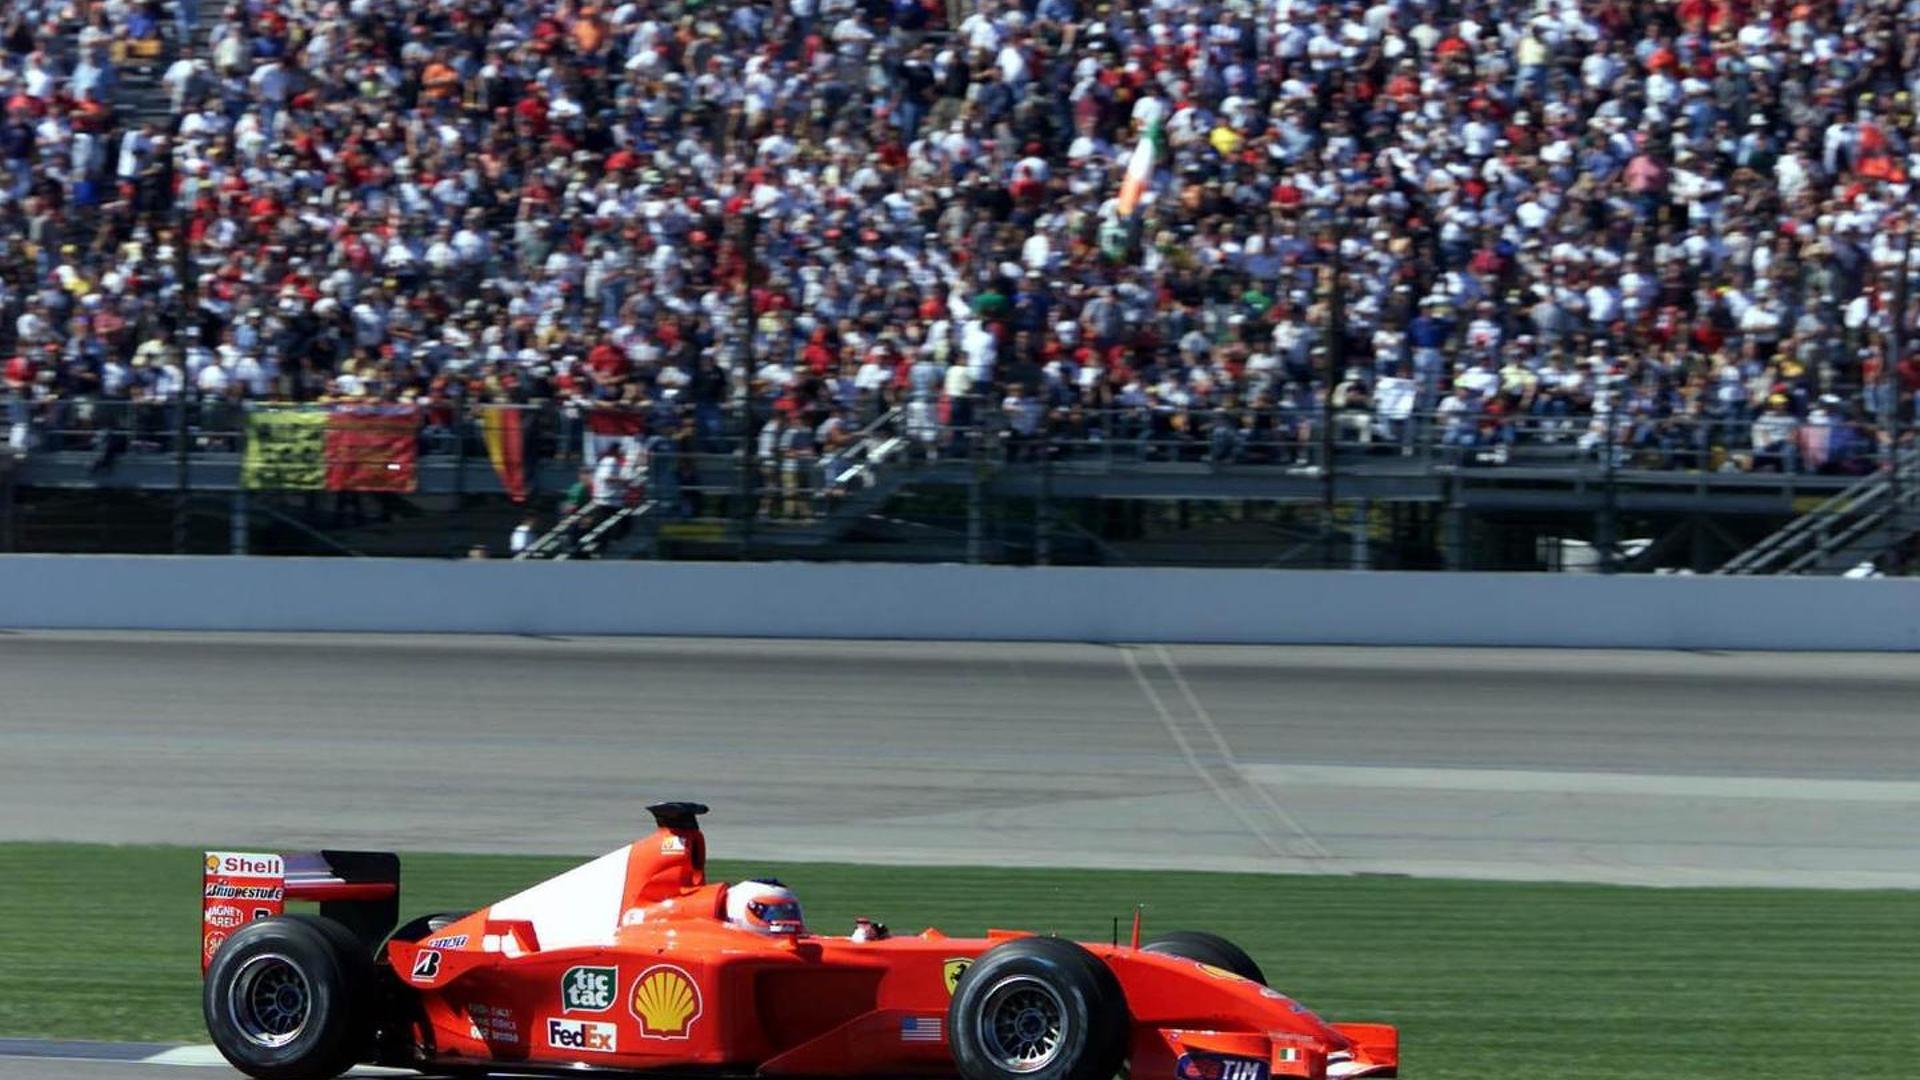 Rubens Barrichello S 2001 F1 Car For Sale At 3 4 M